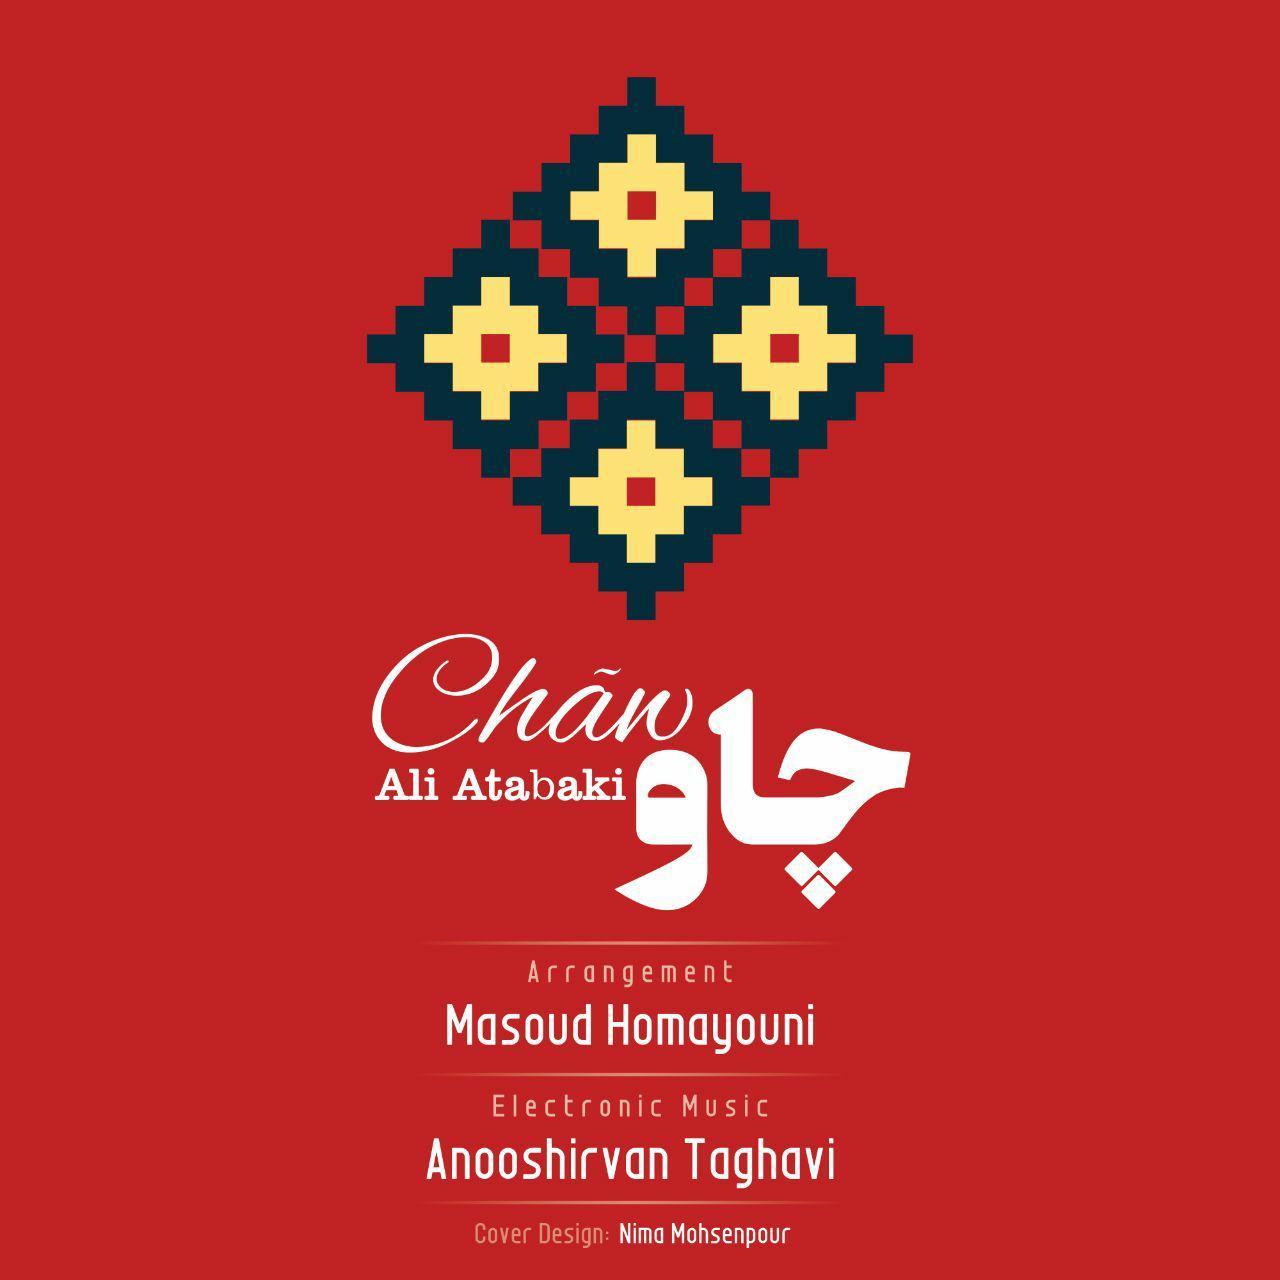 https://www.ganja2music.com/Image/Post/8.2018/Ali%20Atabaki%20-%20Chaw.jpg